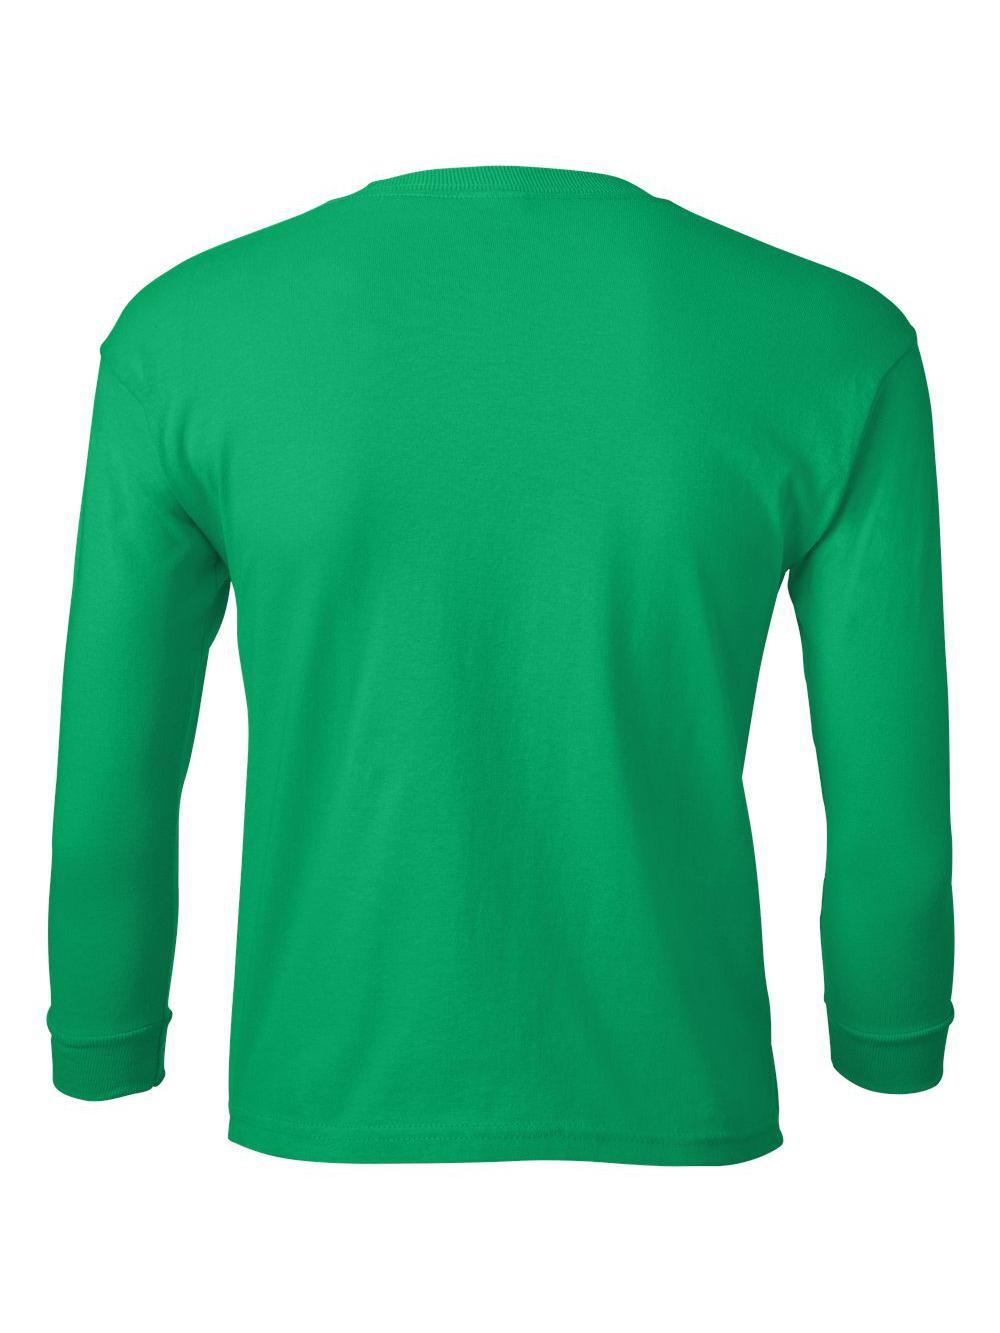 Gildan-Ultra-Cotton-Youth-Long-Sleeve-T-Shirt-2400B thumbnail 13